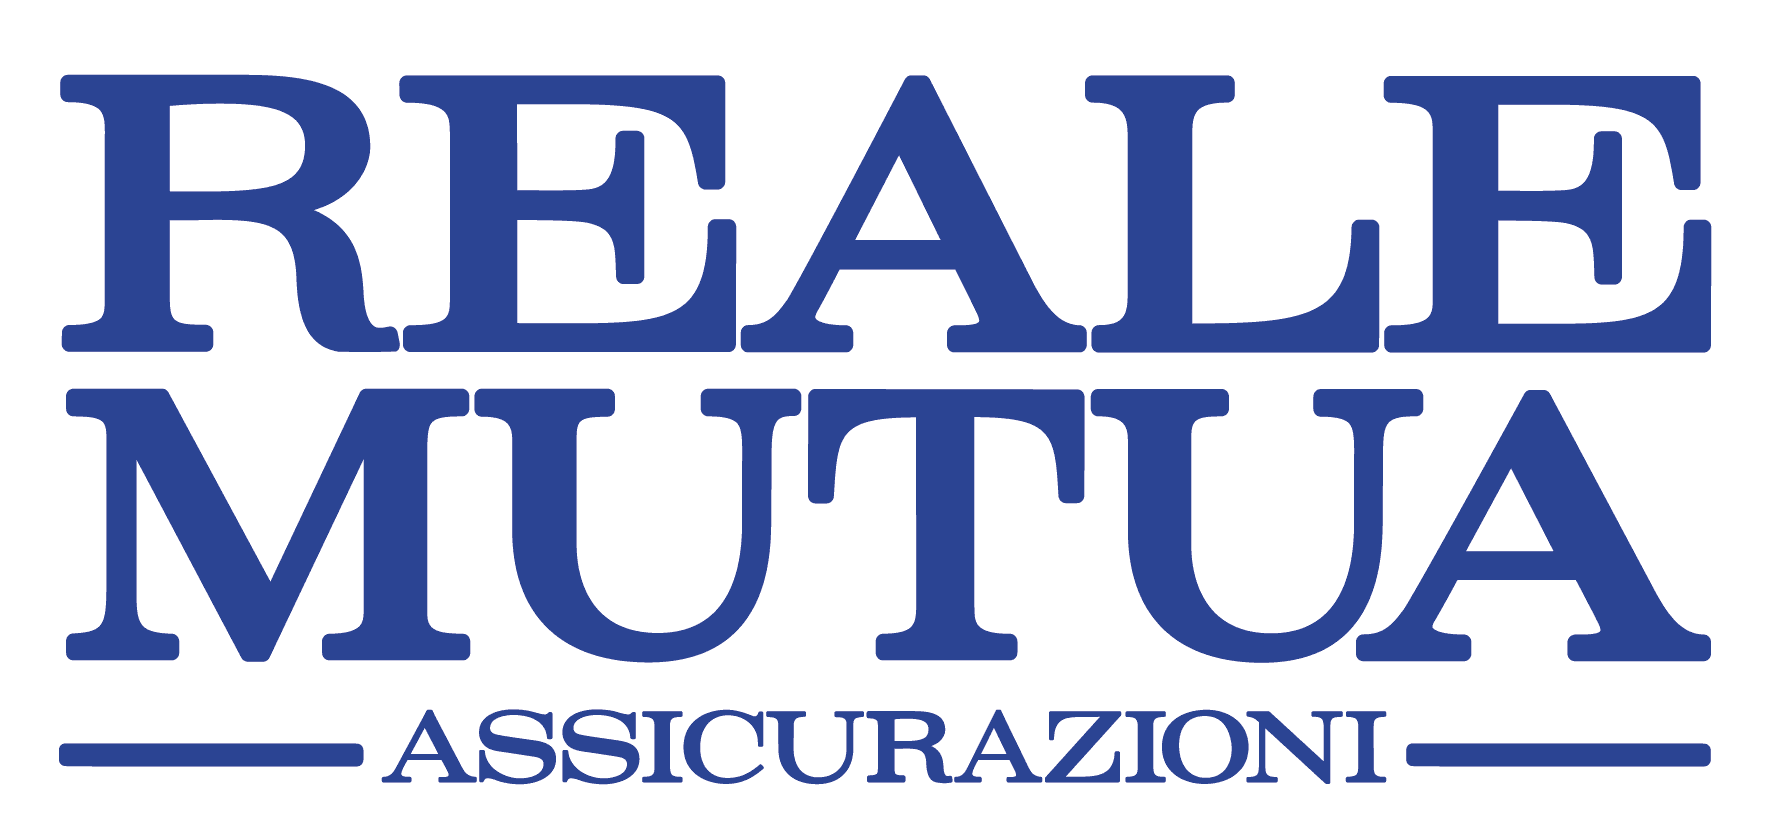 Reale Mutua Assicurazioni - logo